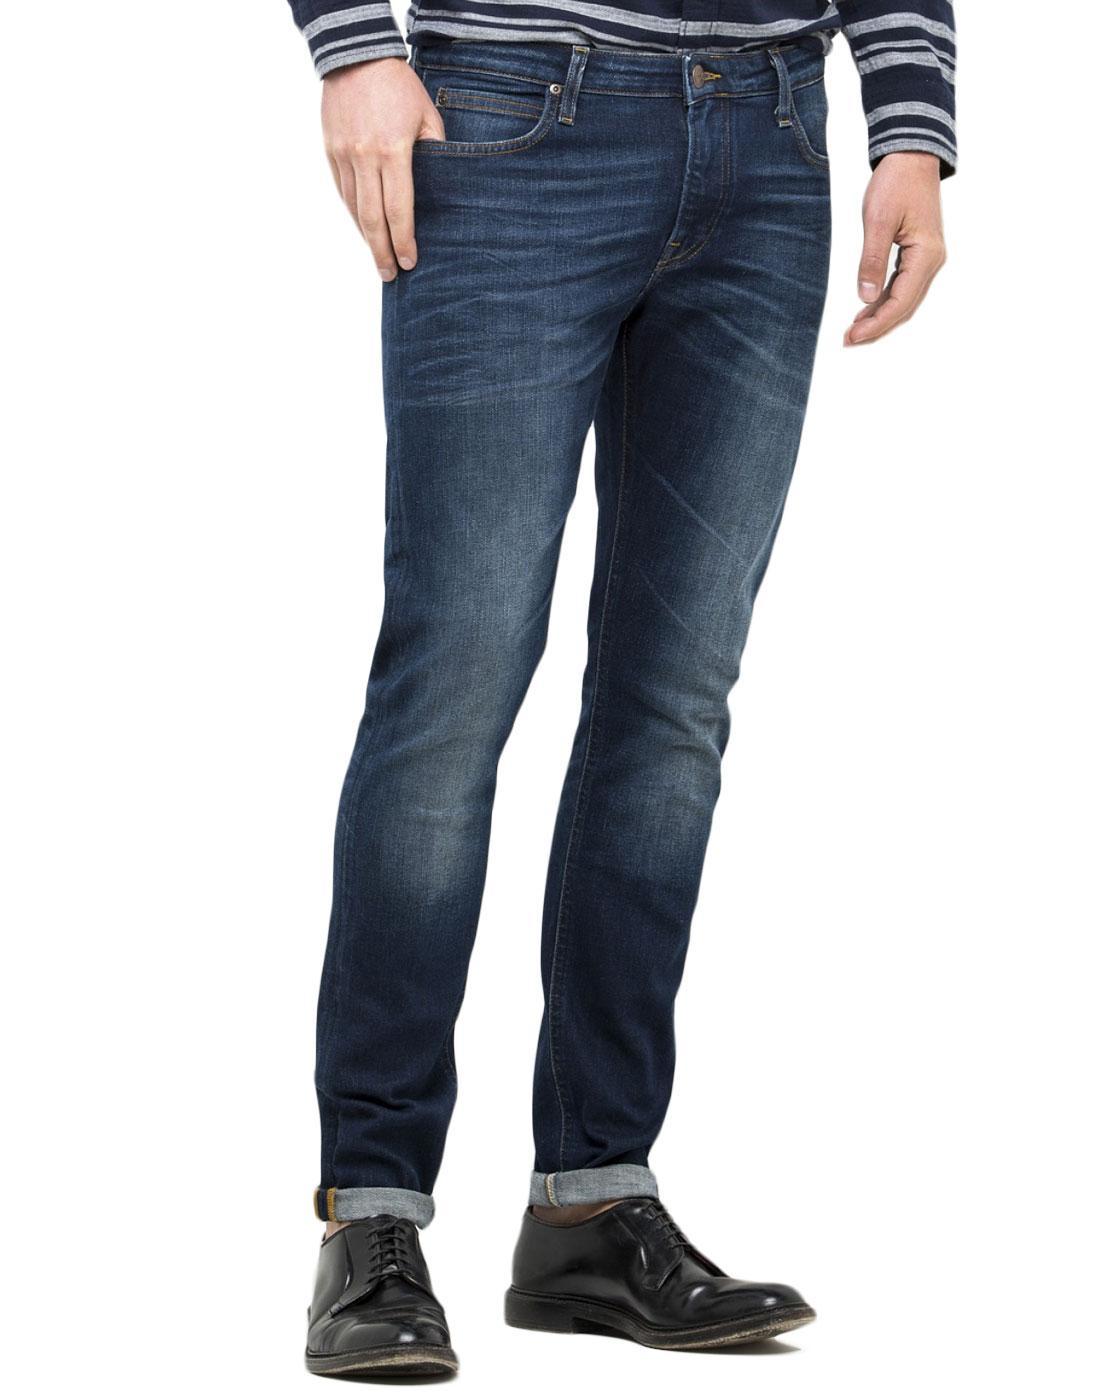 Malone LEE Mod Bright Blue Stretch Skinny Jeans